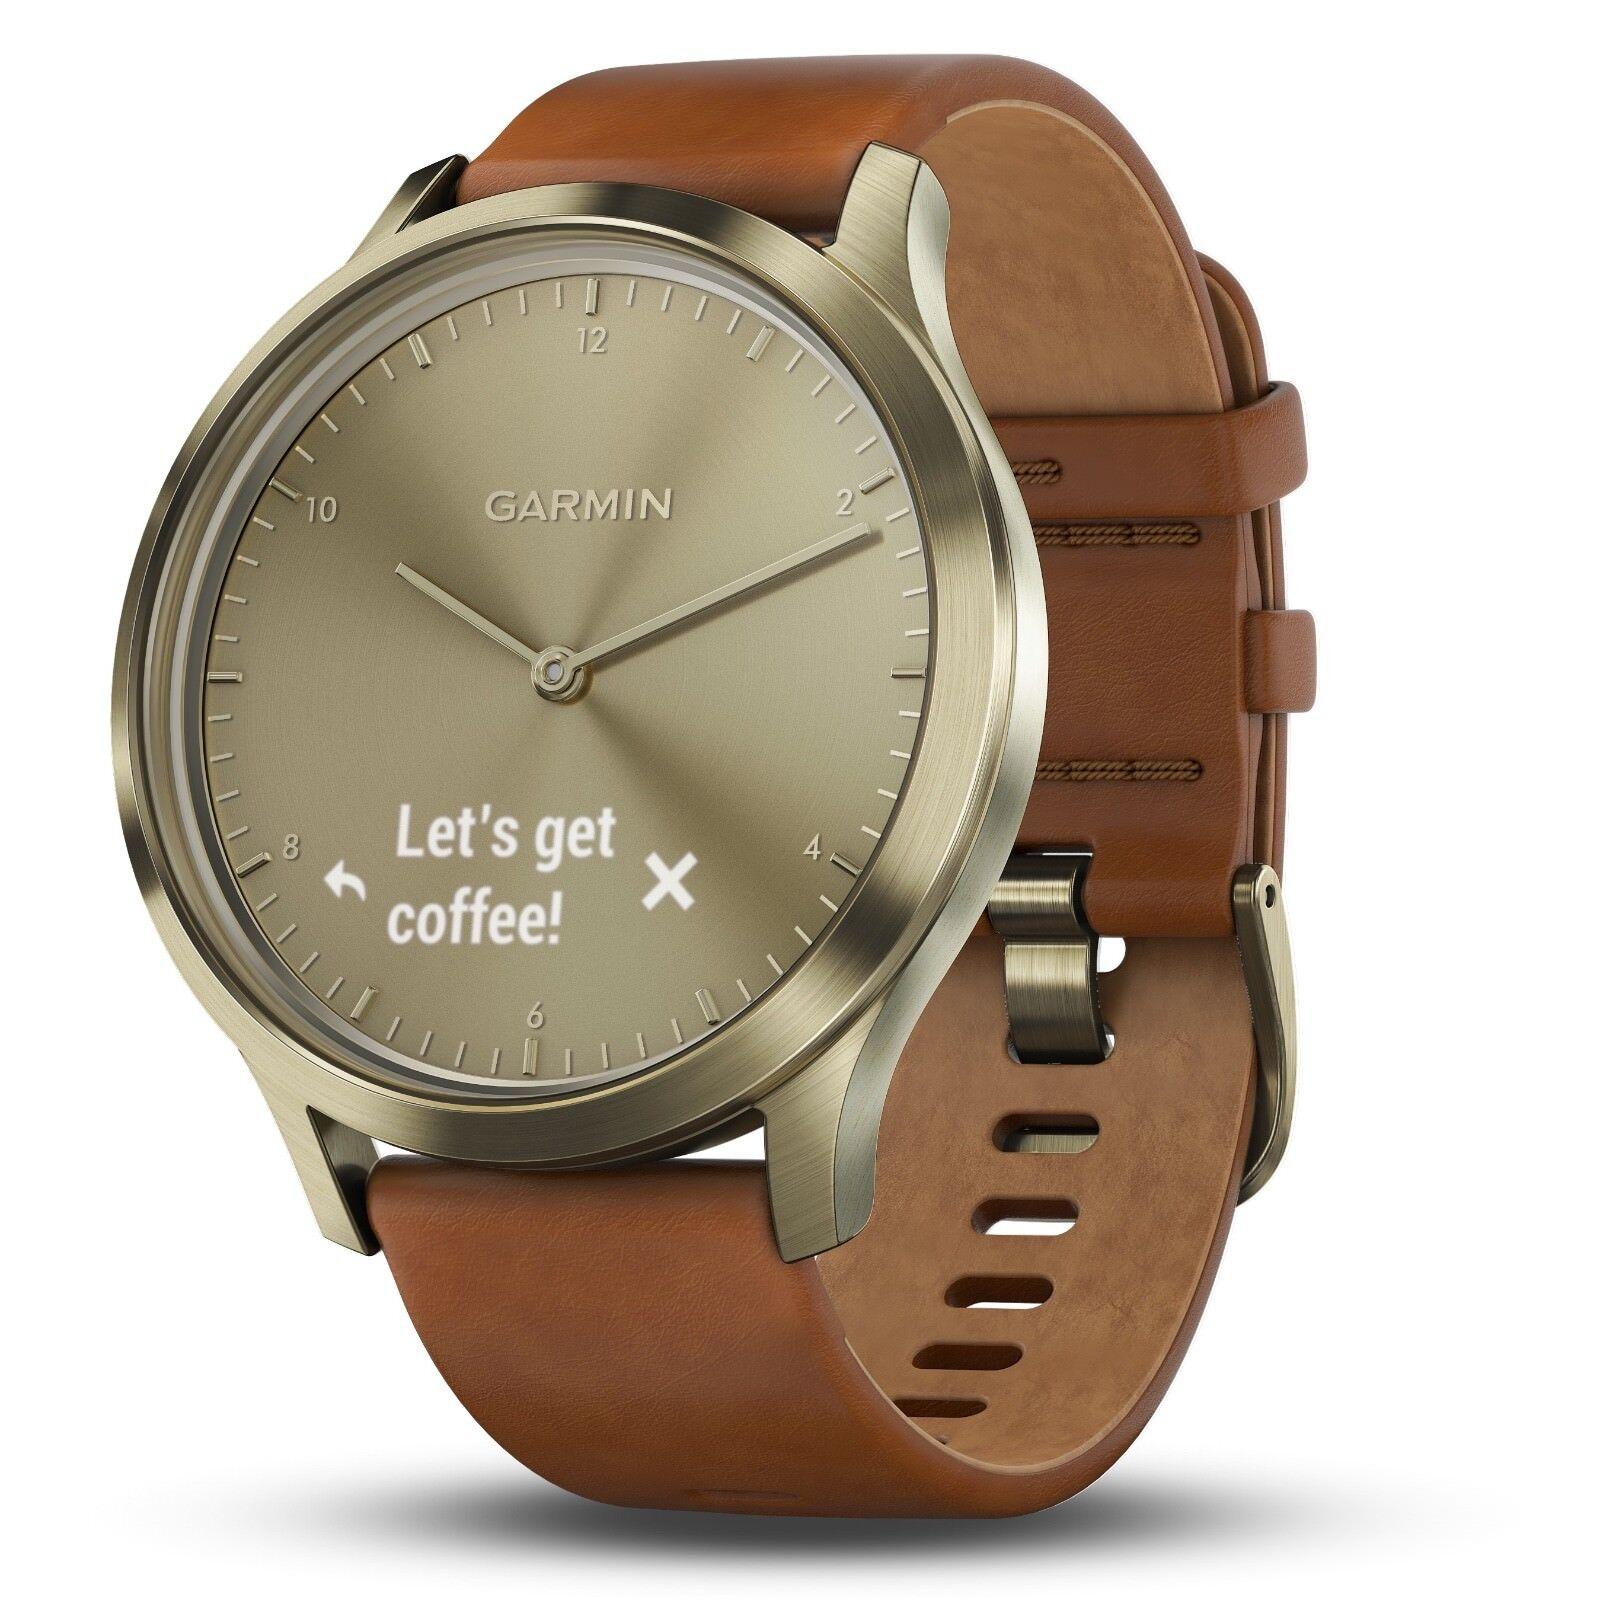 Garmin Vivomove HR Gold 122-189 Hybrid Smartwatch Small, Medium 122-189 Gold mm 010-01850-15 773382